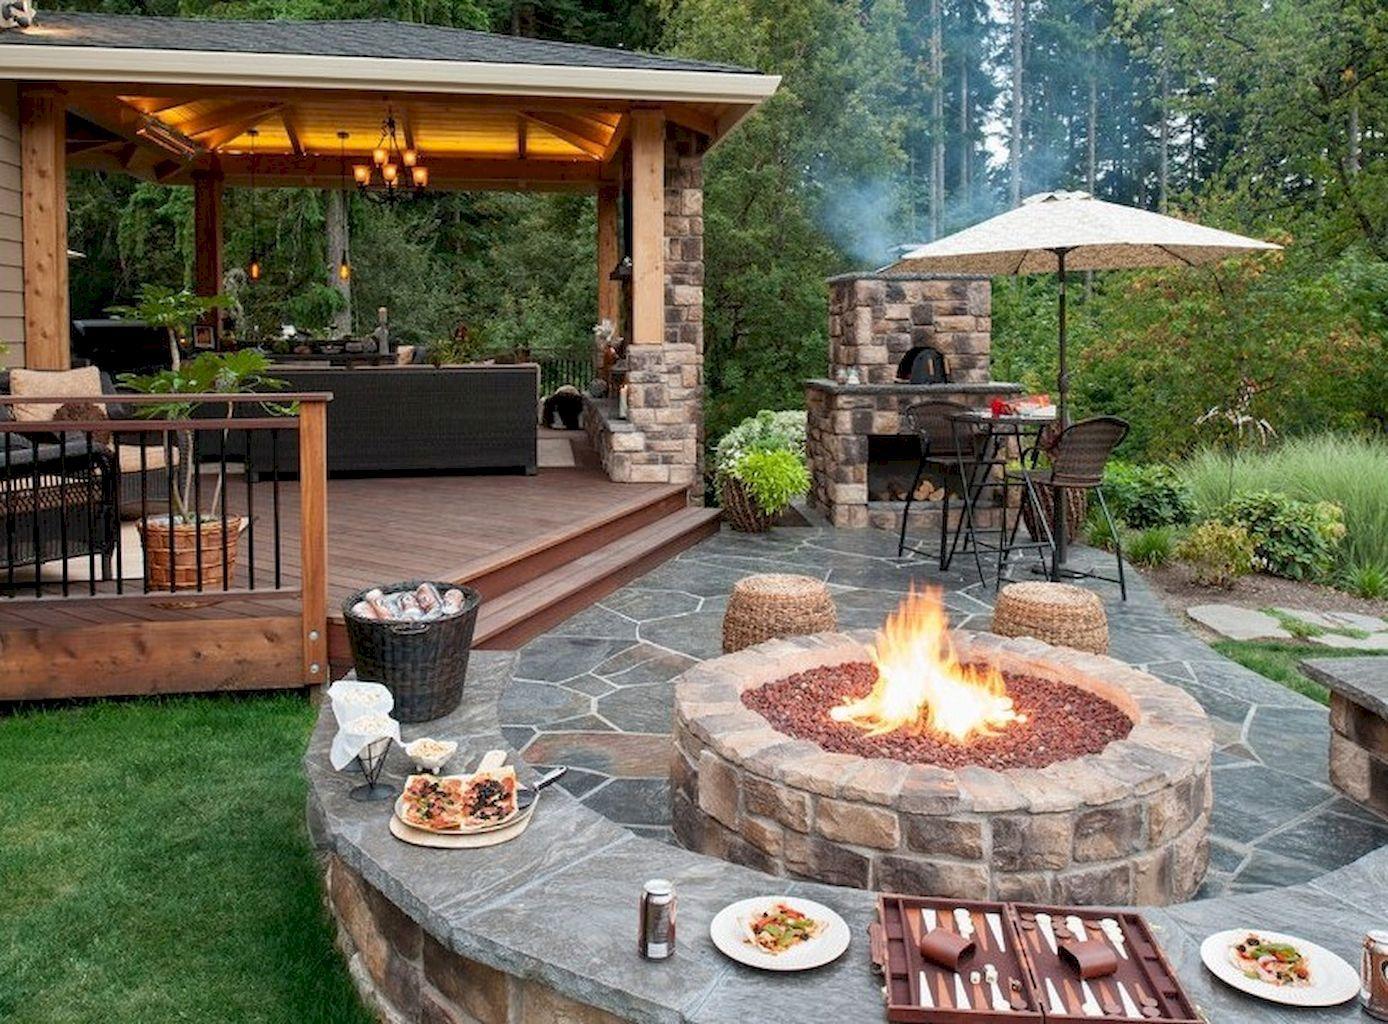 55 Easy DIY Backyard Seating Area Ideas on A Budget ... on Back Garden Seating Area Ideas id=22624